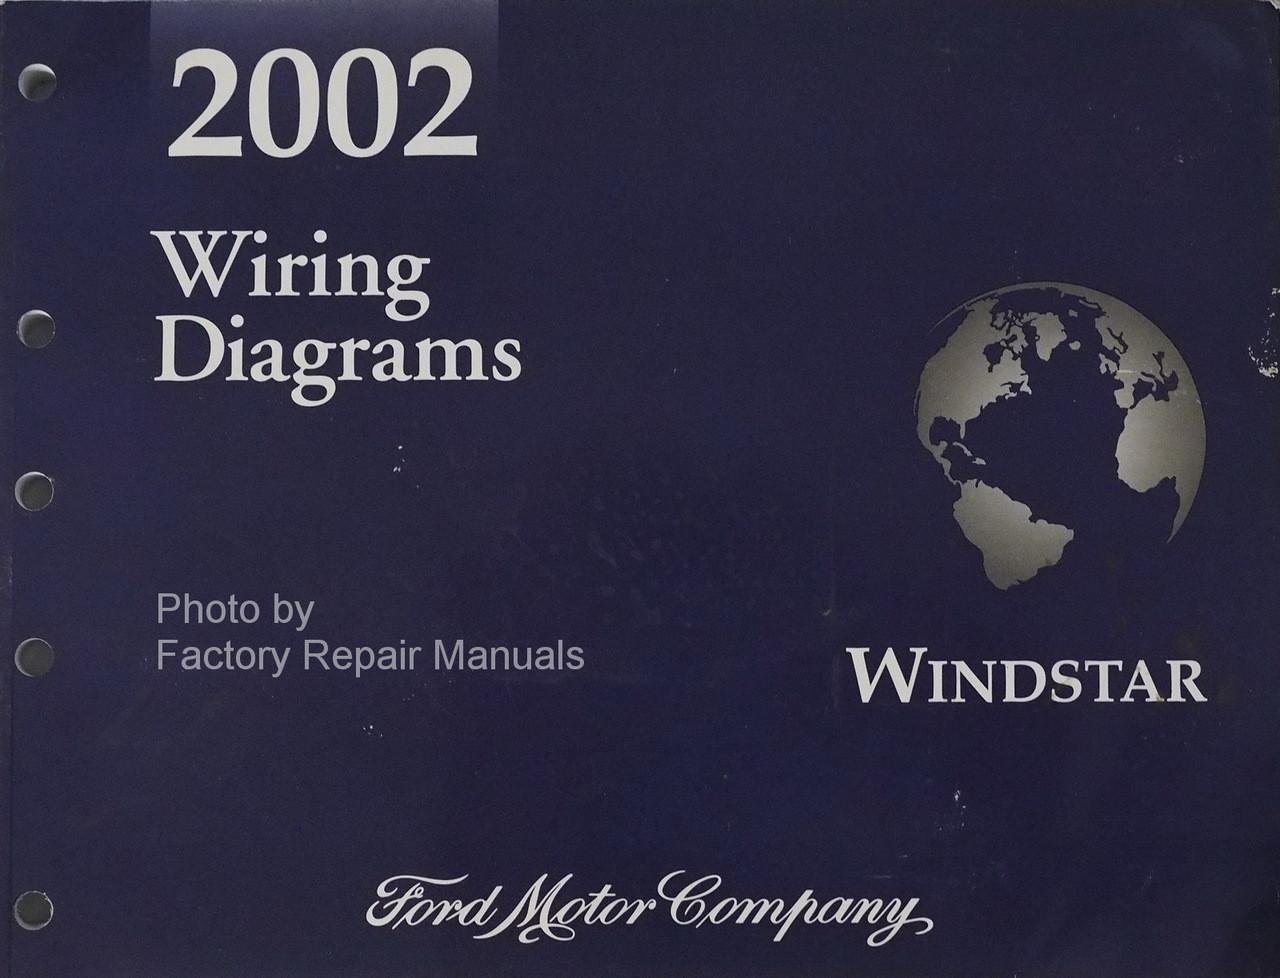 [SCHEMATICS_4UK]  2002 Ford Windstar Electrical Wiring Diagrams Original Manual - Factory  Repair Manuals | Ford Windstar Electrical Wiring Diagrams |  | Factory Repair Manuals